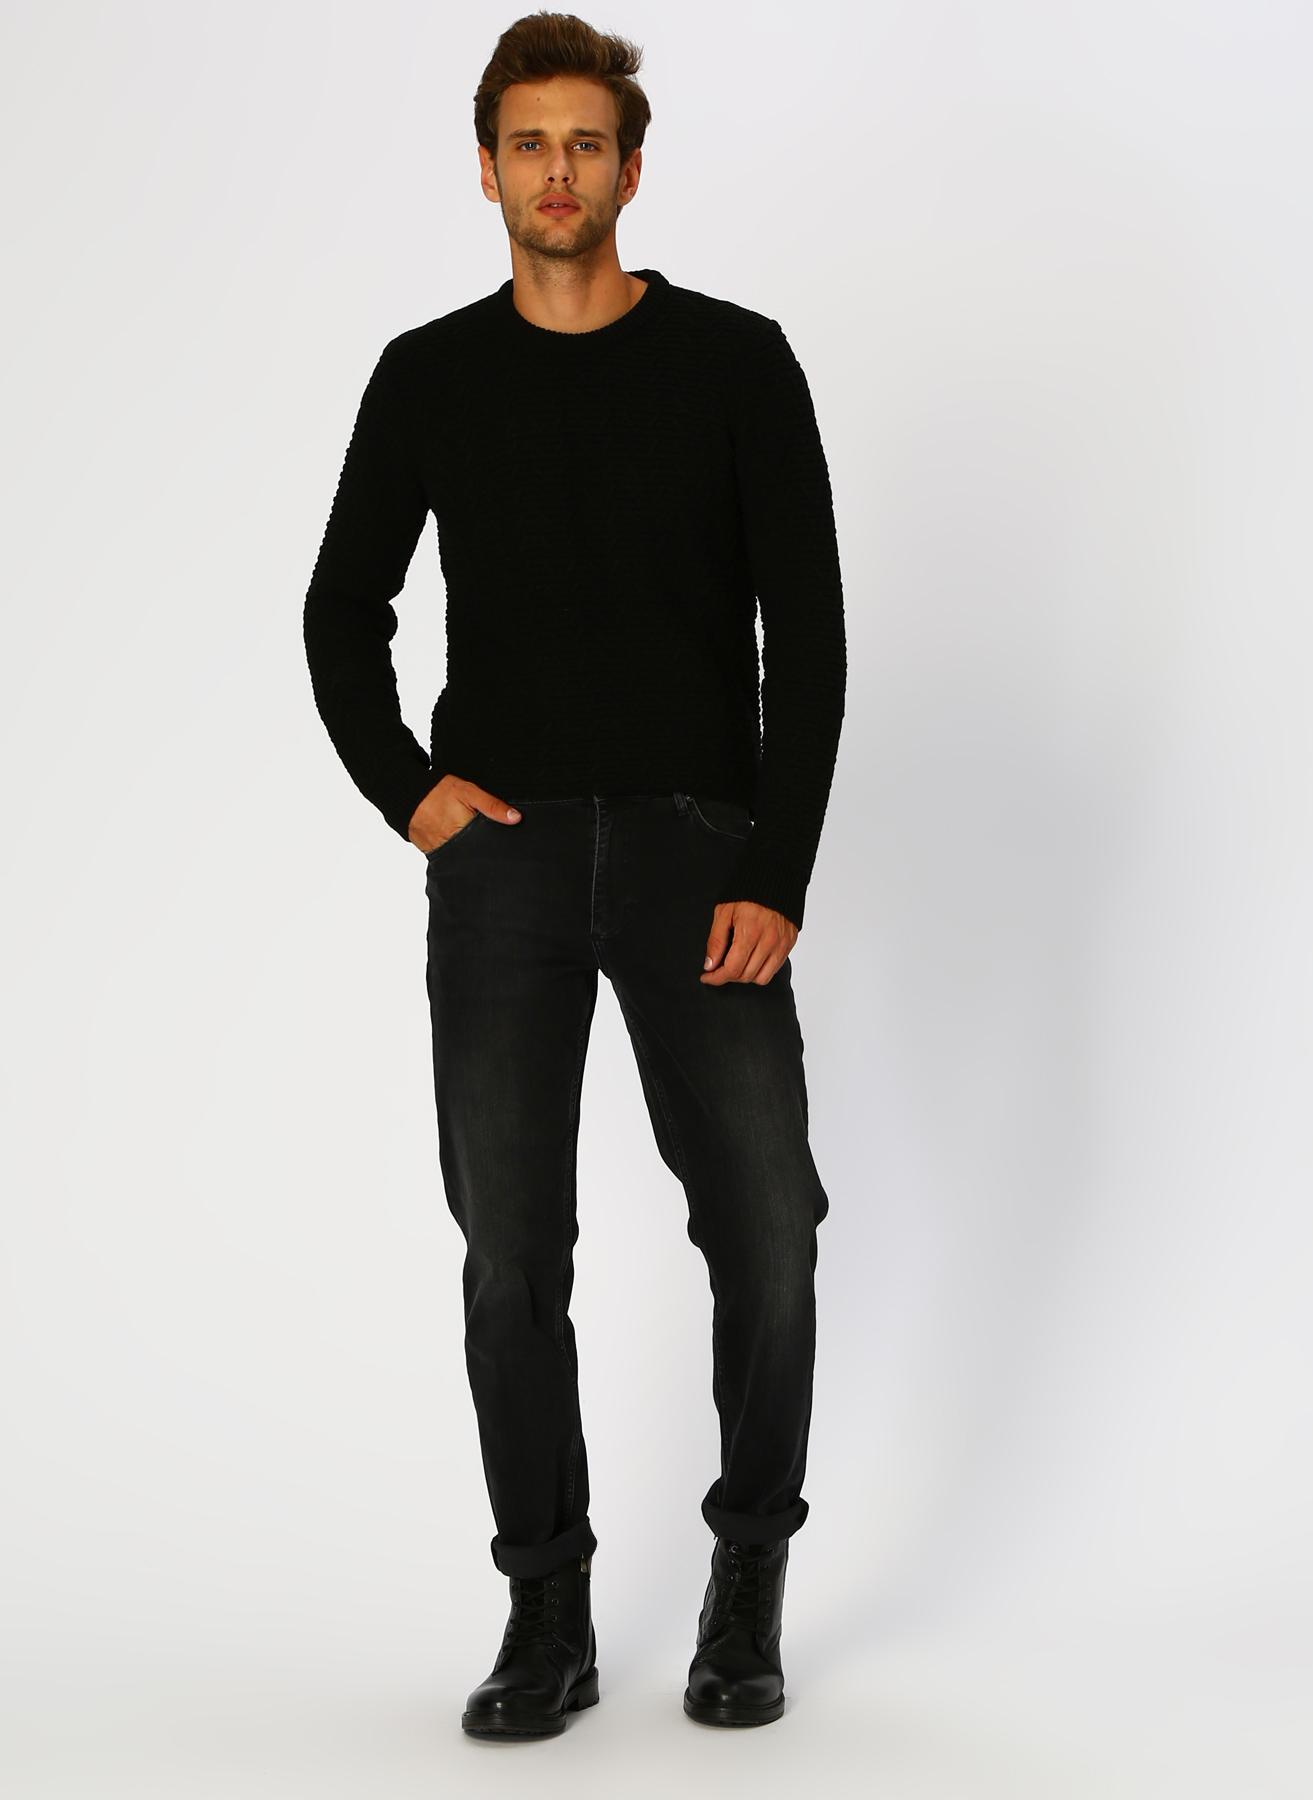 Lee Cooper Klasik Pantolon 34-30 5001699785010 Ürün Resmi